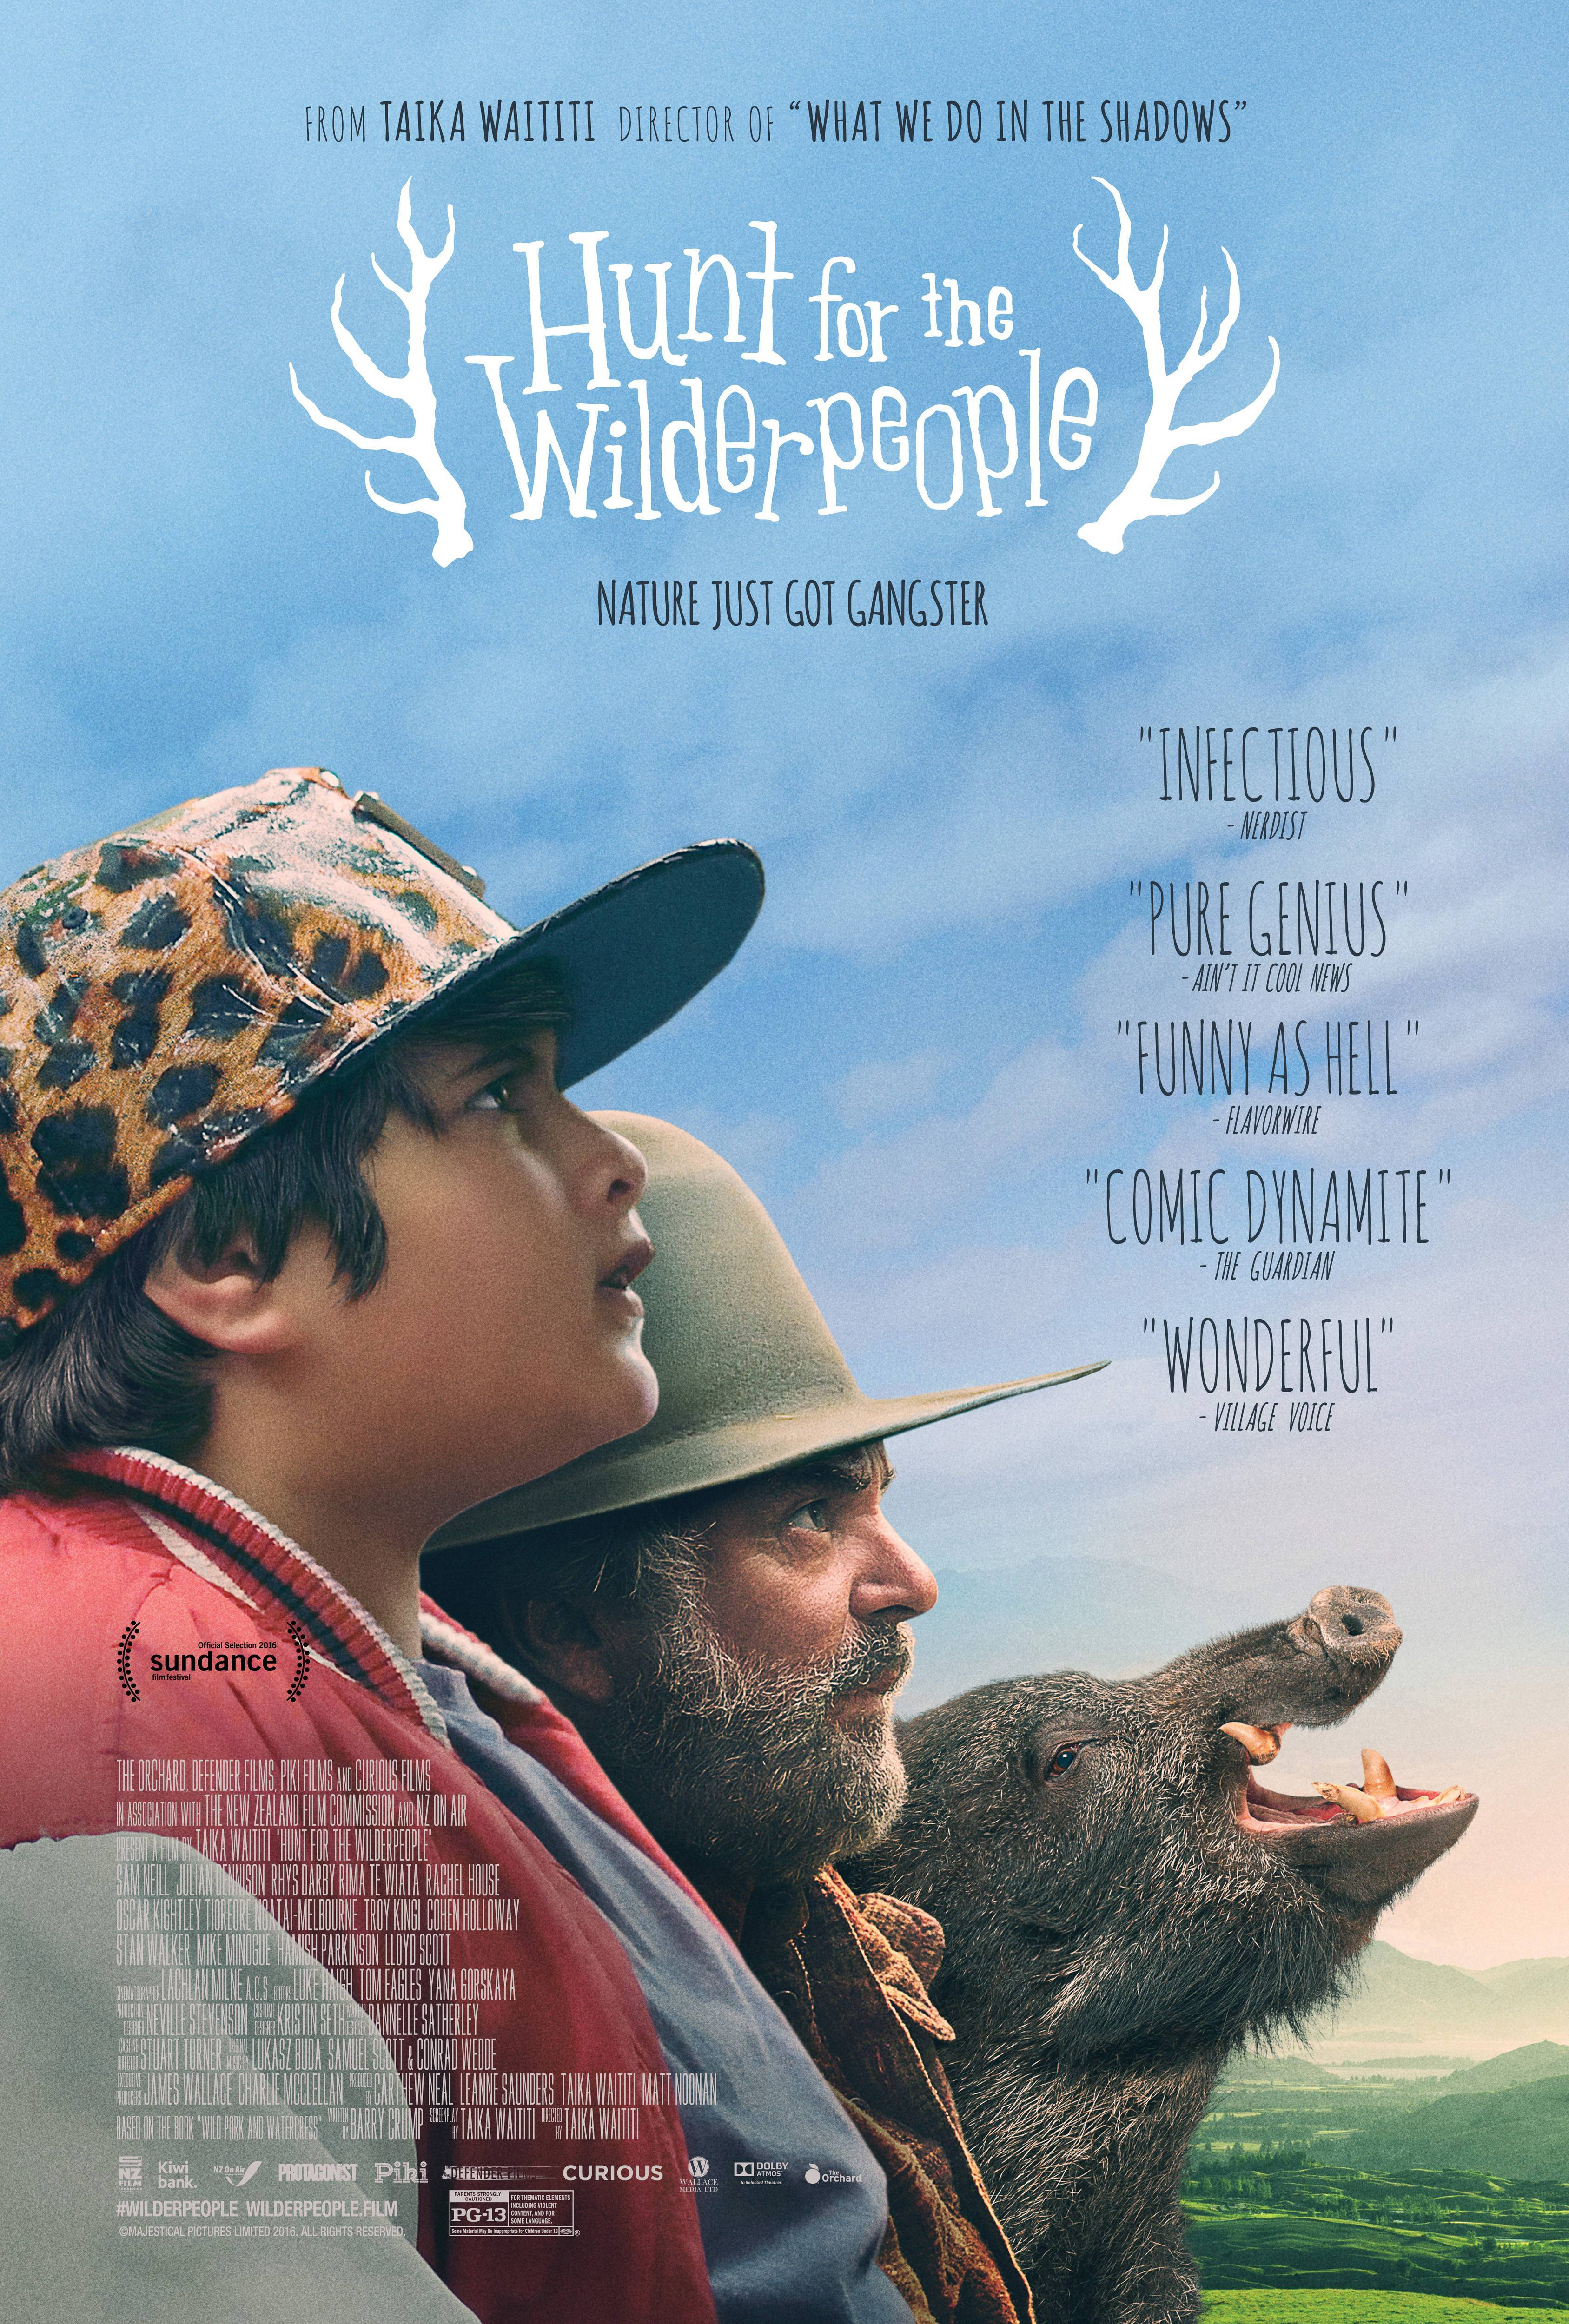 追捕野蛮人/寻找蛮人/神鬼嚎野人 Hunt for the Wilderpeople (2016)百度云迅雷下载